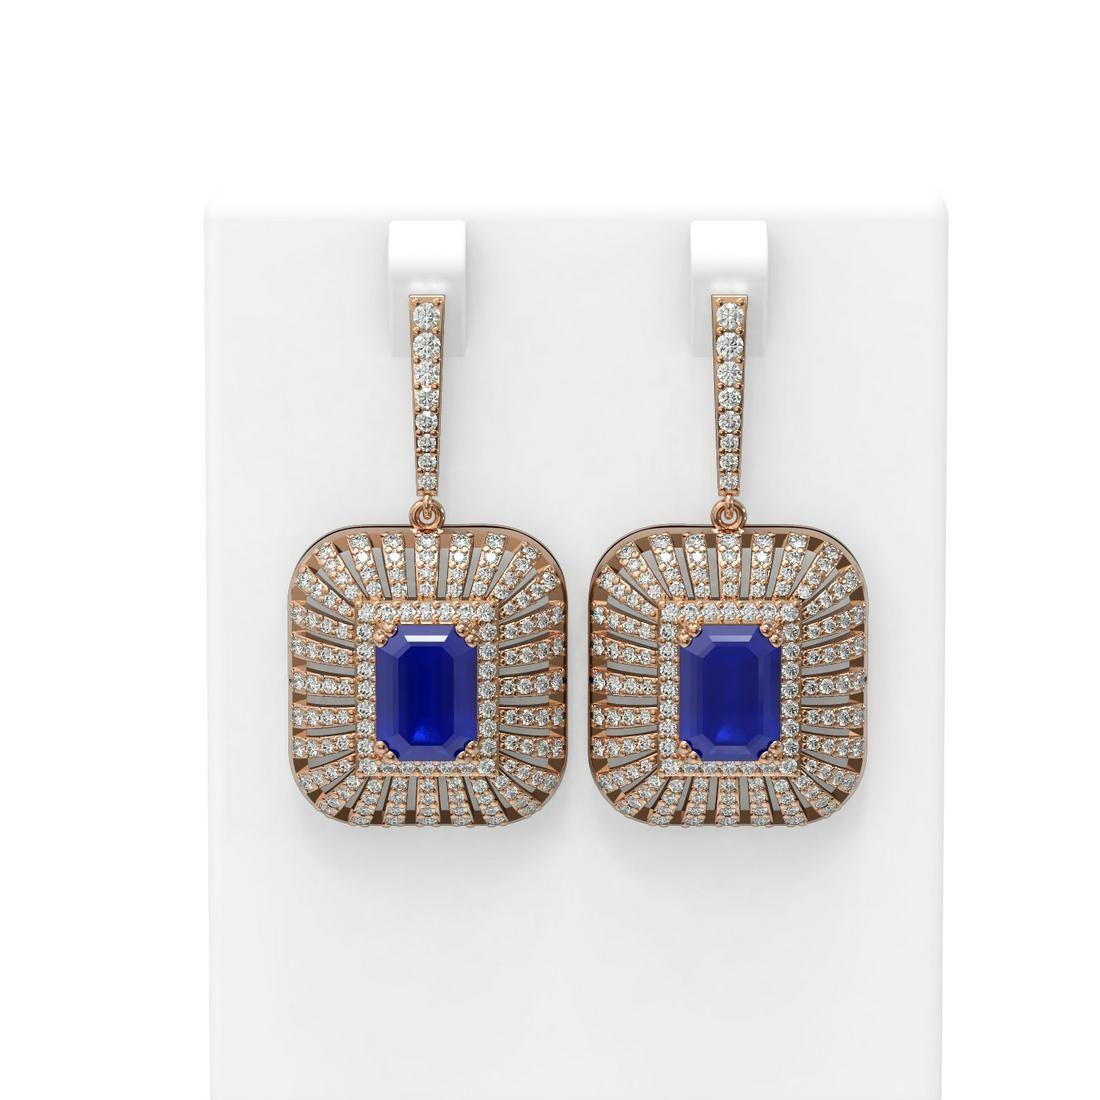 16.73 ctw Sapphire & Diamond Earrings 18K Rose Gold -